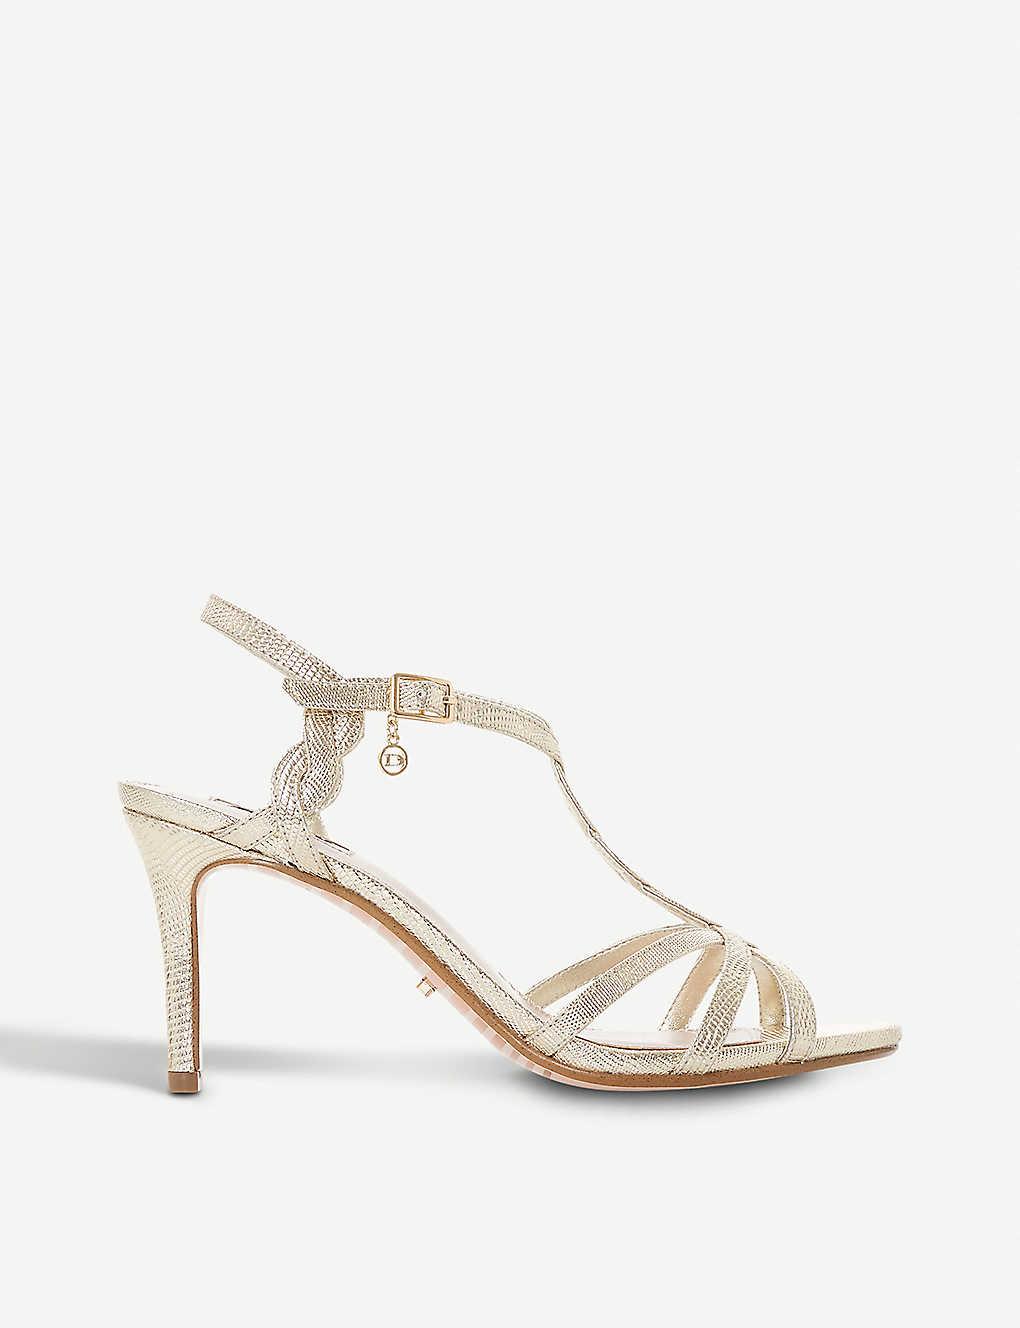 cfe209a82fb Mystick patent mid-heel sandals - Goldreptile synthetic ...